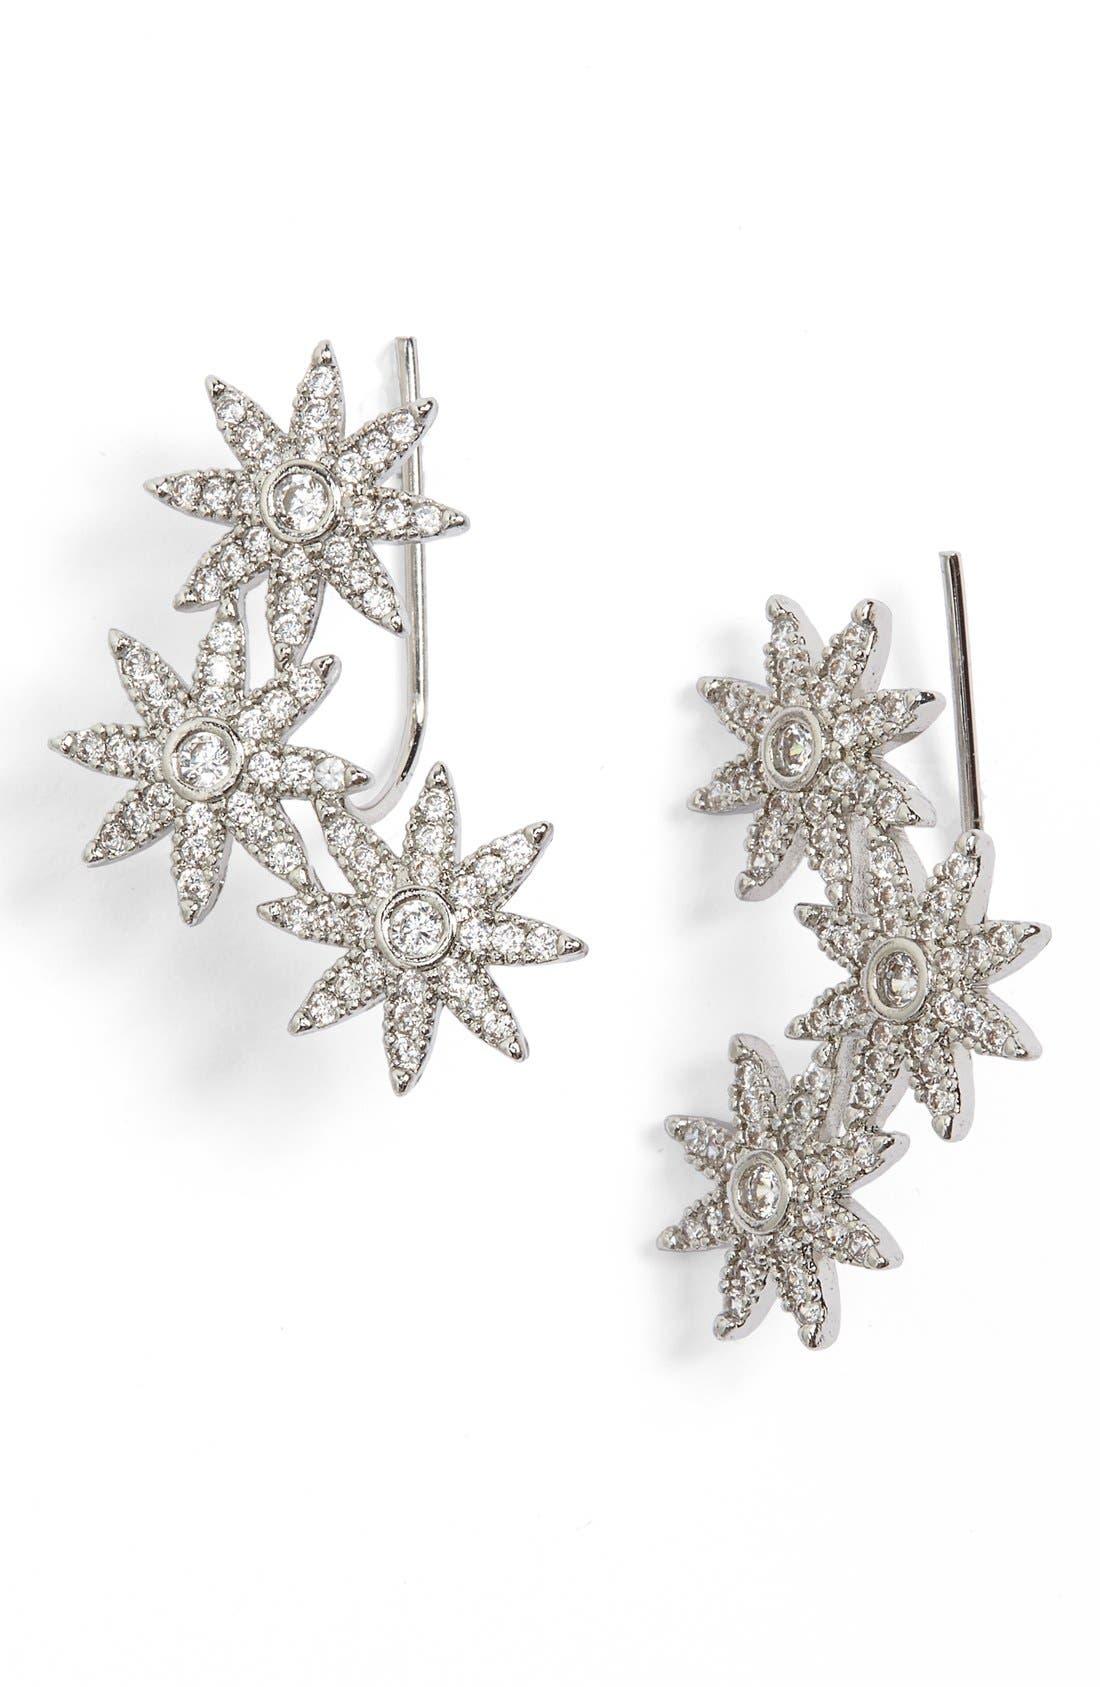 Main Image - Sole Society Crystal Star Ear Crawlers